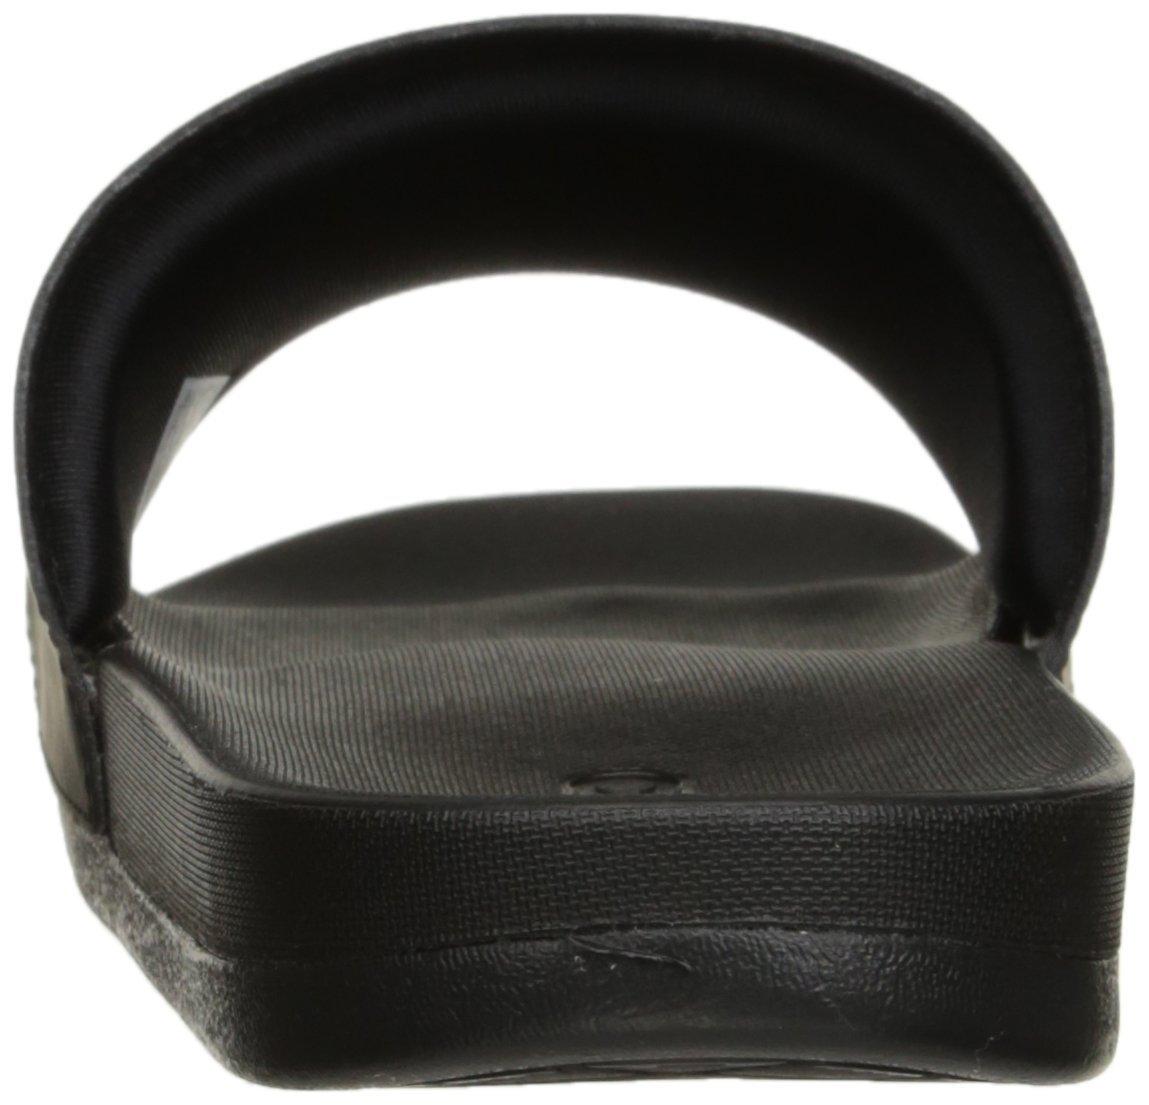 adidas Performance Women's Adilette CF Ultra Stripes C W Athletic Sandal B019EM5XHO 9 M US|Black/White/Black